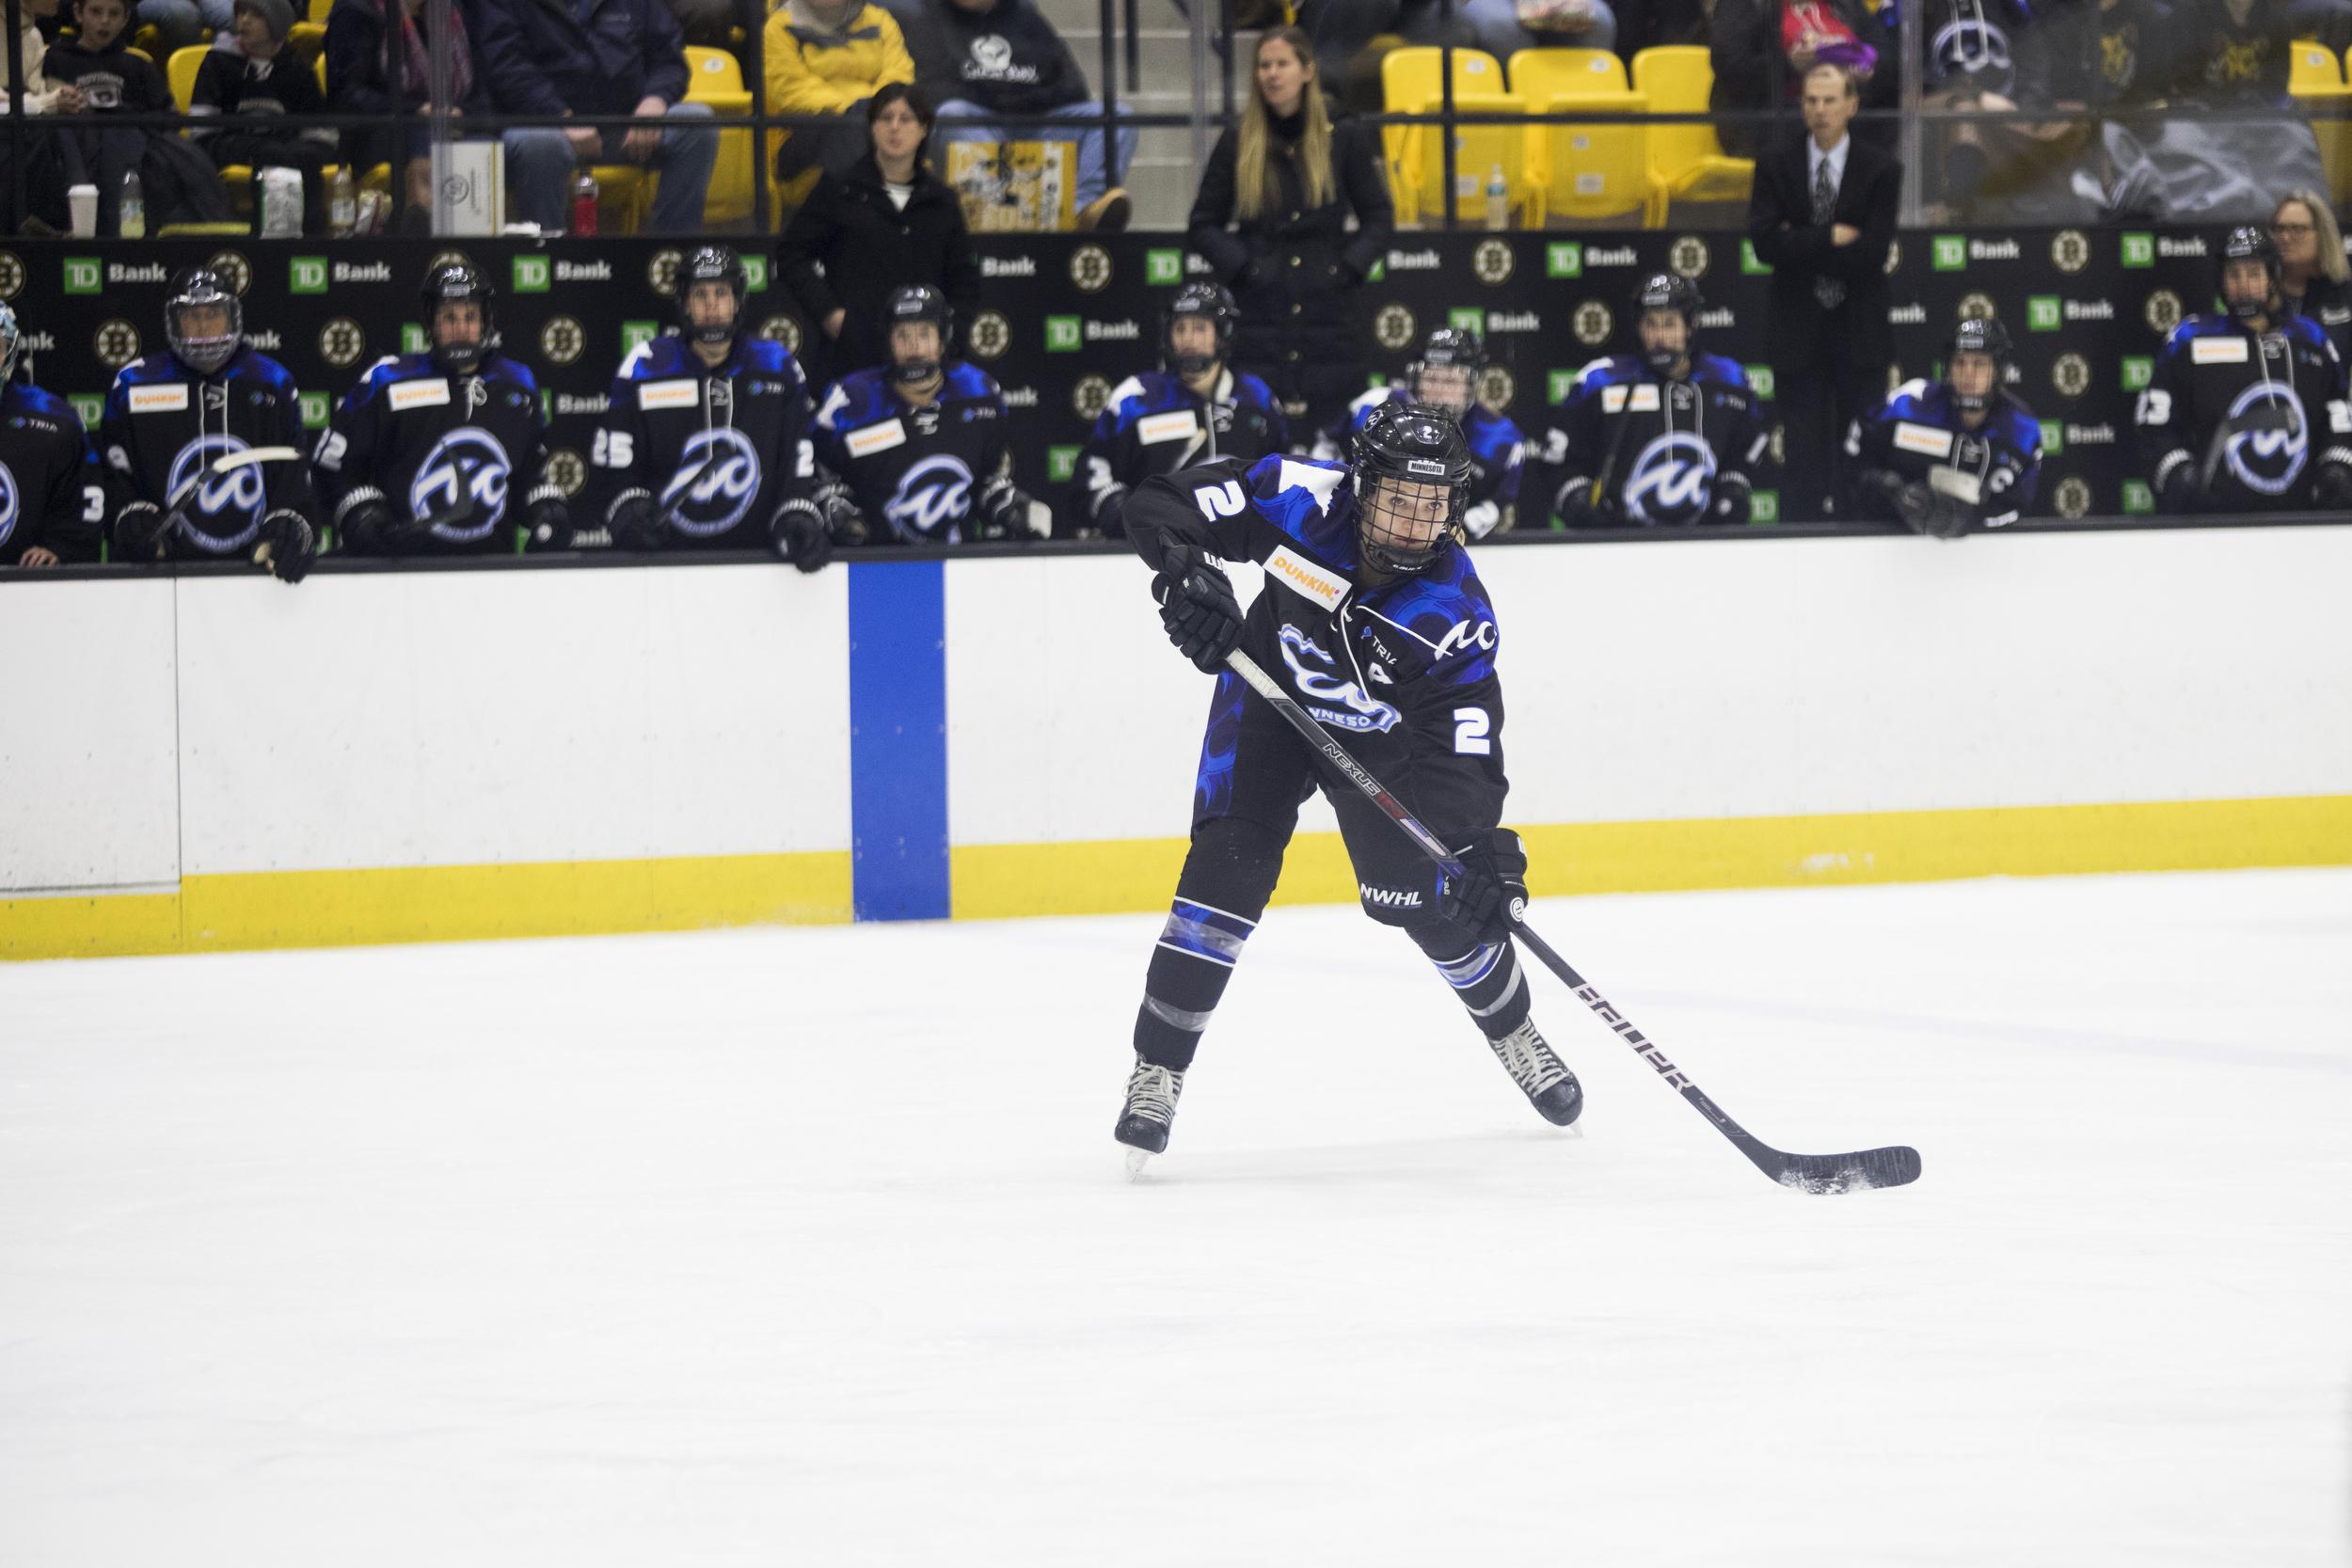 Minnesota Whitecaps overtime hero Lee Stecklein (#2)